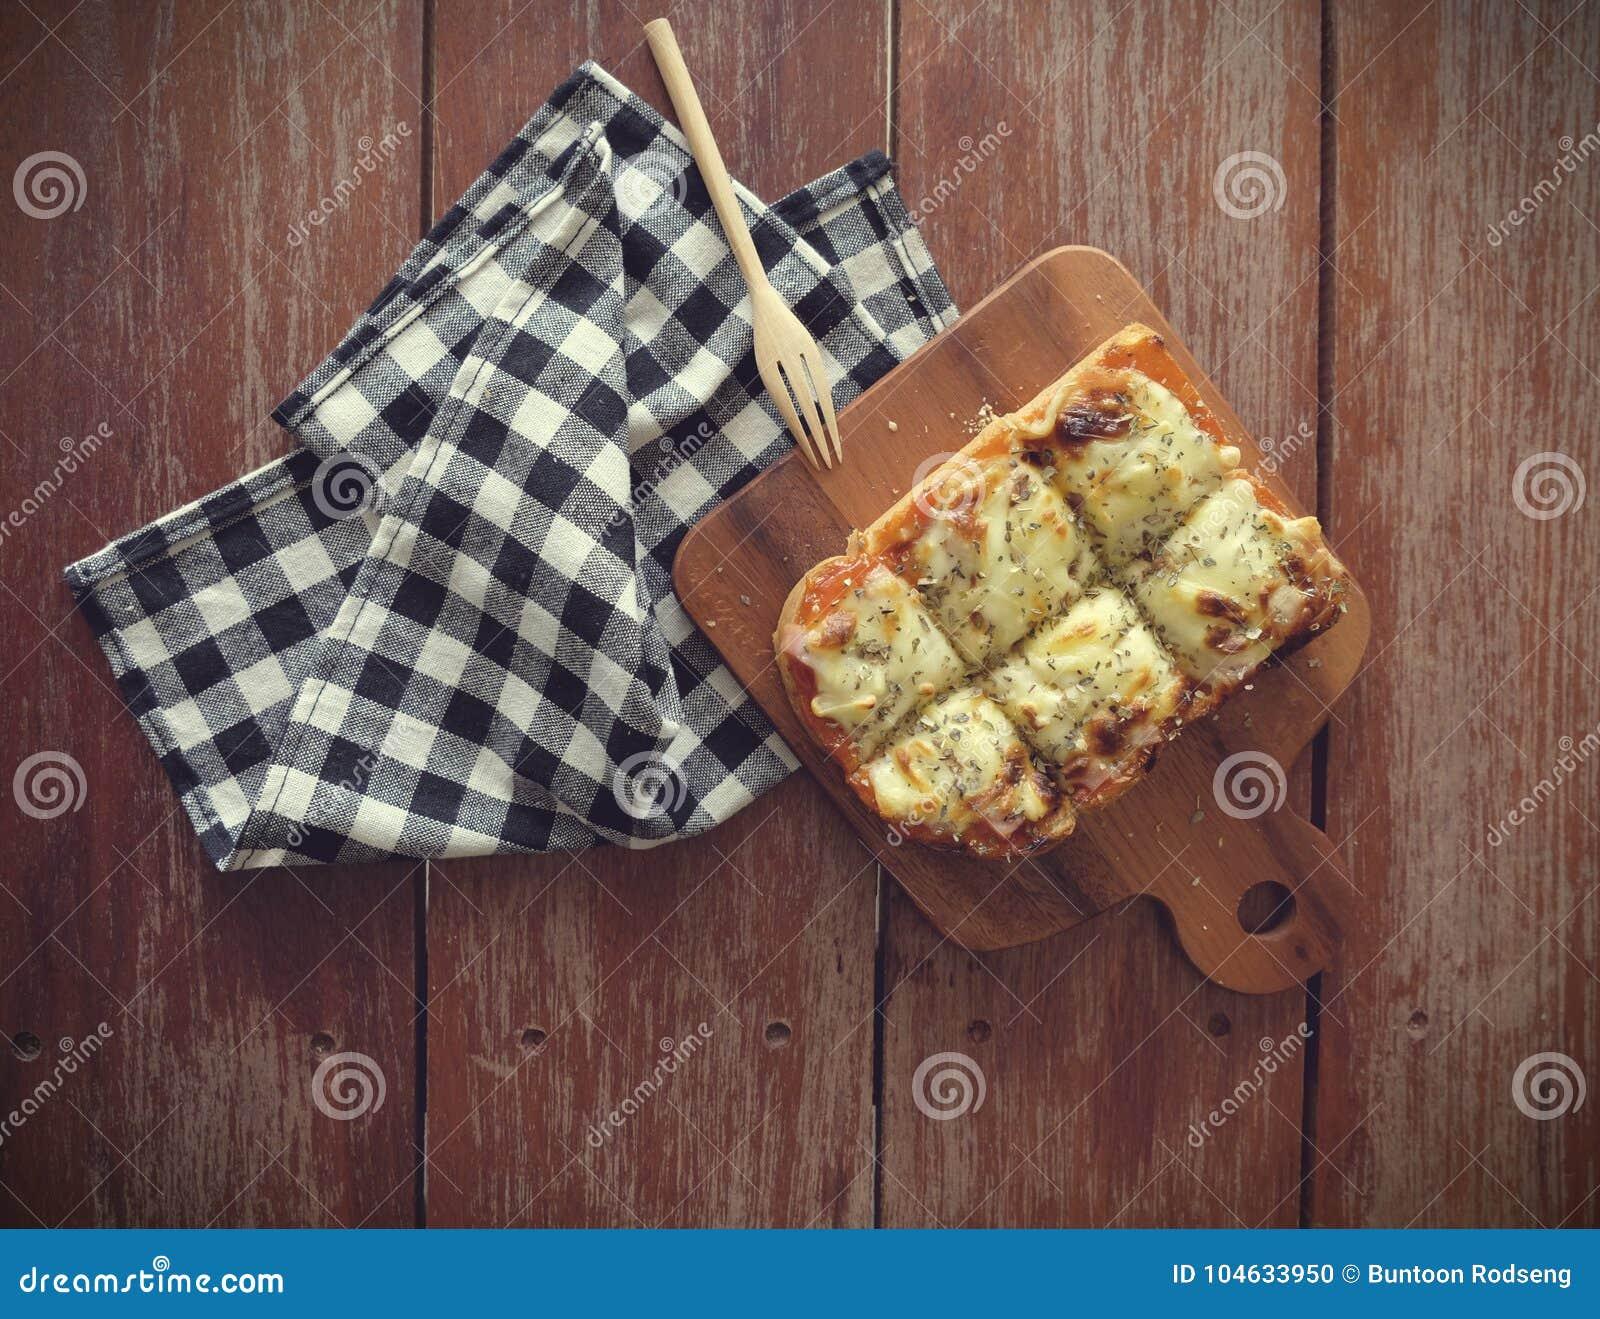 Download Pizza Geroosterd Brood Met Tomatensaus En Hamkaas Stock Foto - Afbeelding bestaande uit bruin, kaas: 104633950